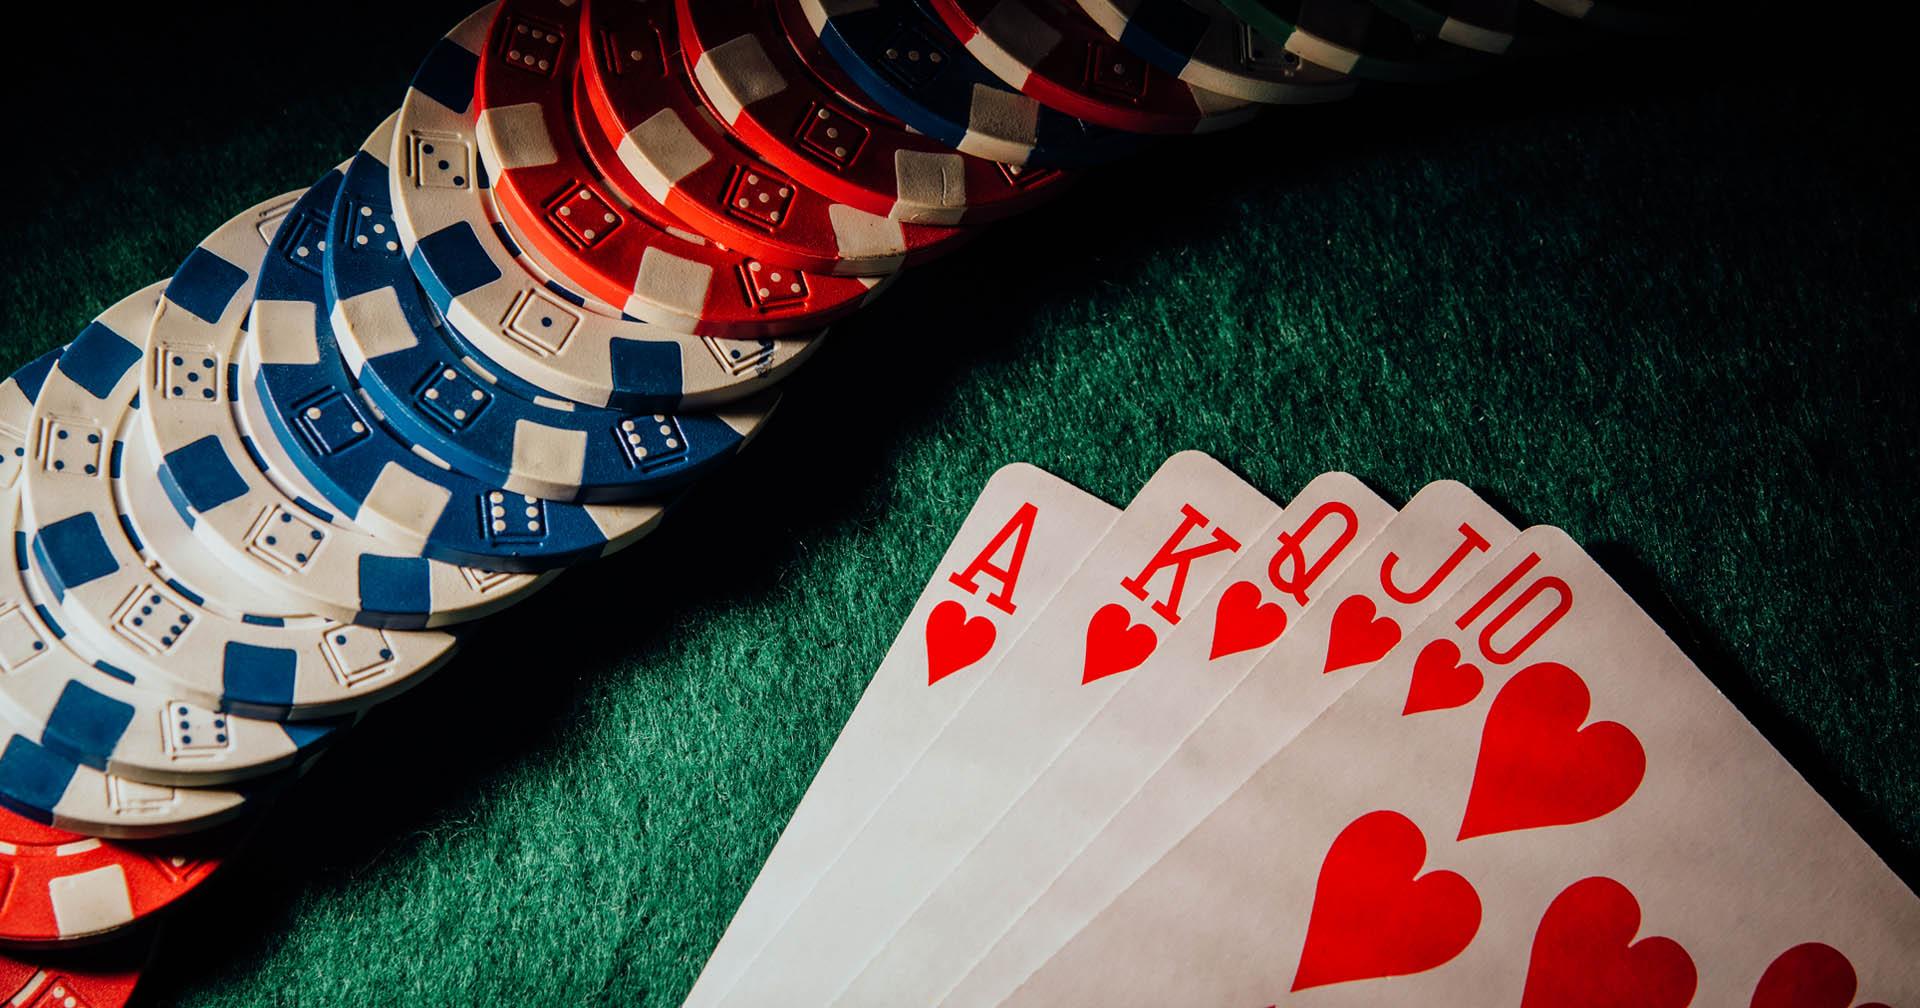 The 8 Commandments of Hosting Poker Night | InsideHook